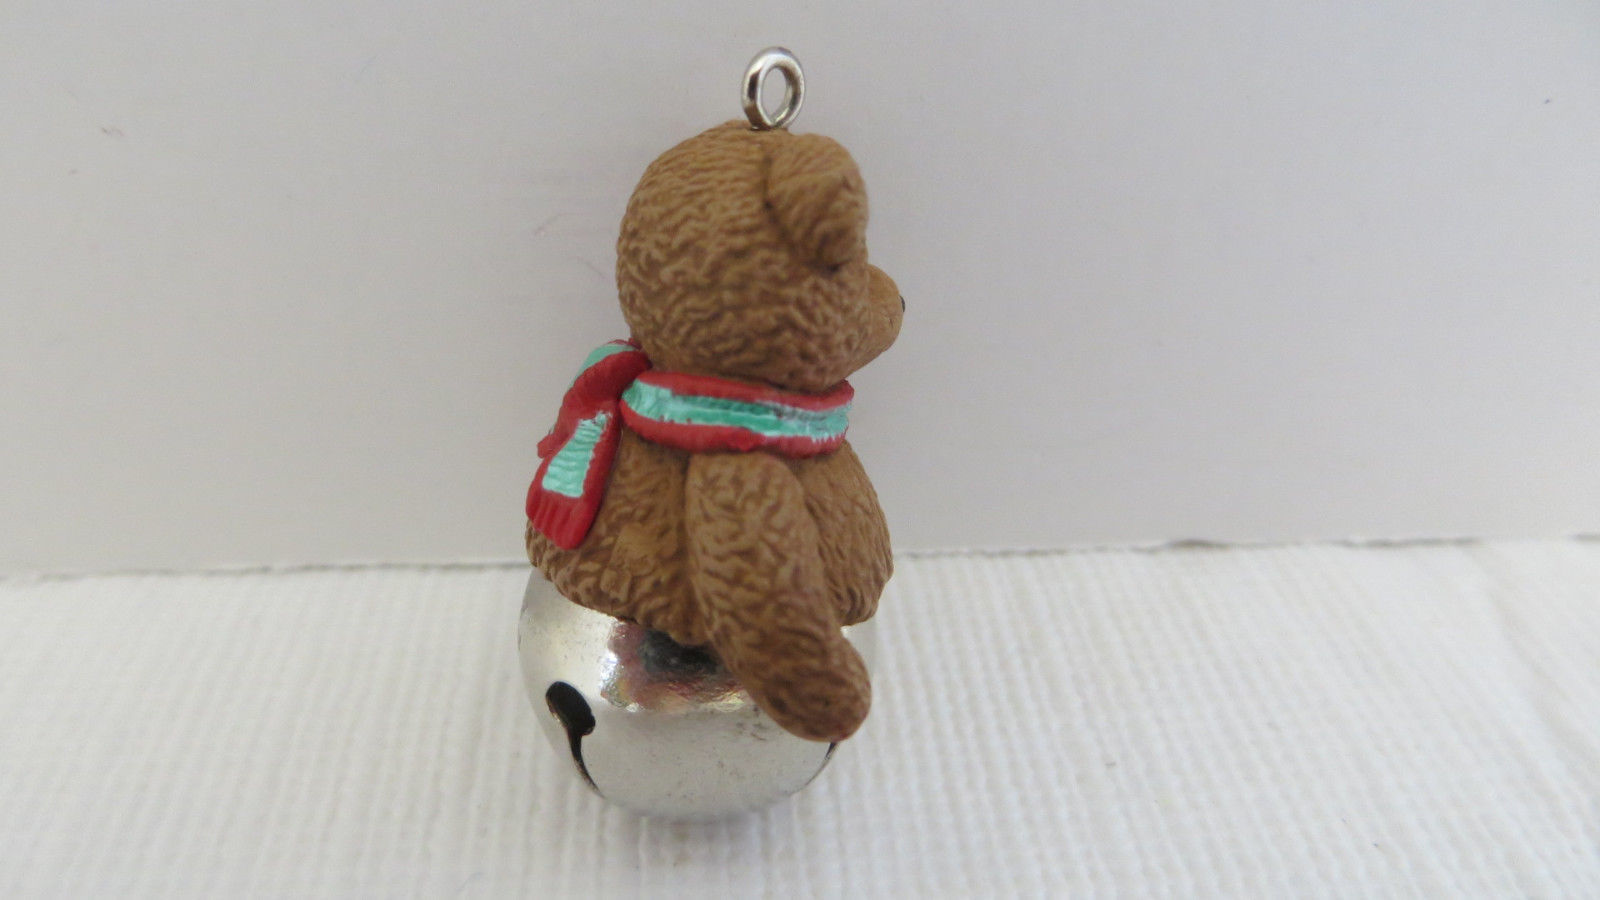 Hallmark /'1998 Teddy-Bear Style/' 2nd in Teddy-Bear Series Miniature Ornament NIB